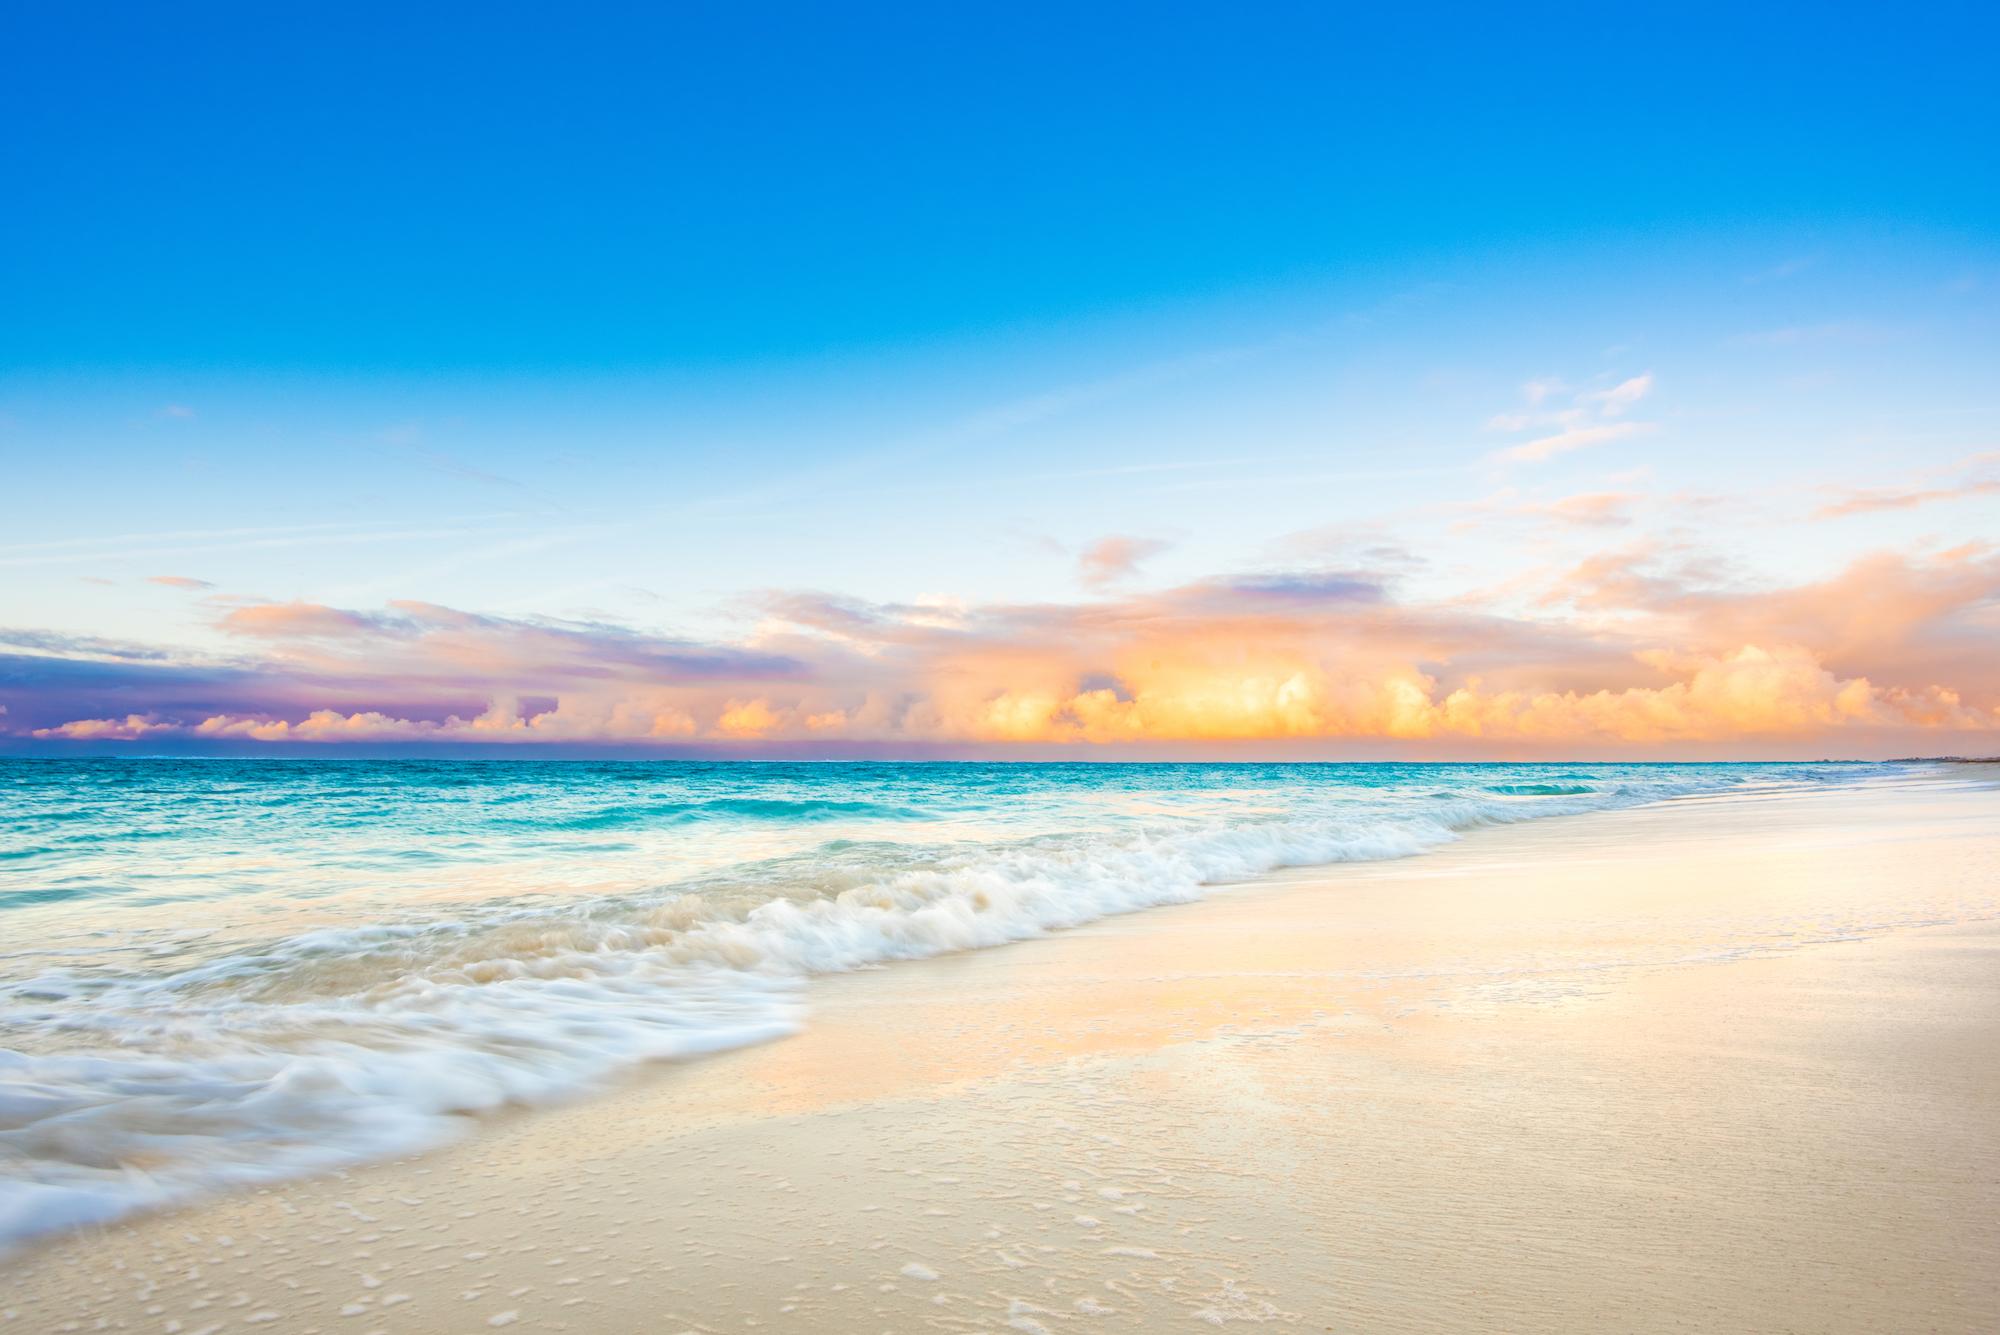 North Bay Beach, Turks and Caicos